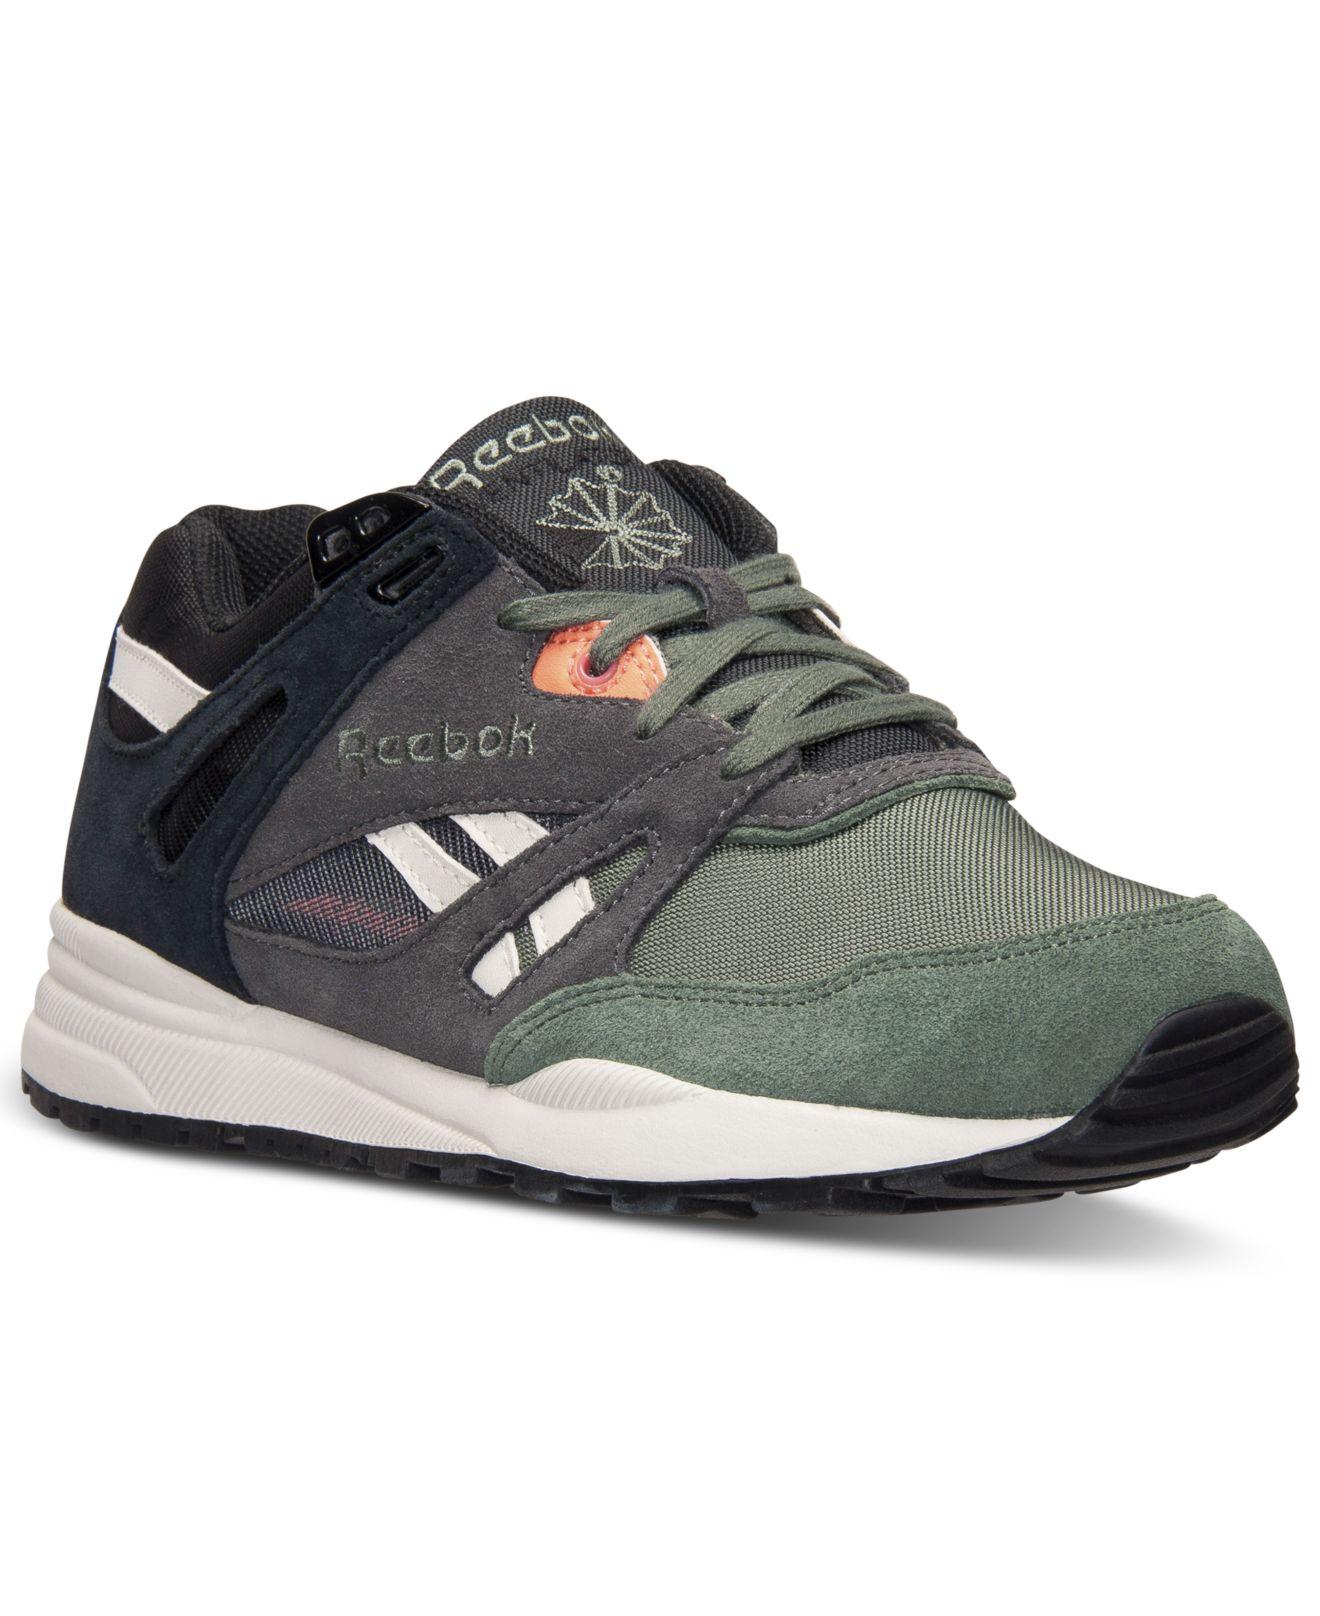 Lyst - Reebok Women s Ventilator Casual Sneakers From Finish Line in ... 08d08a2b16a